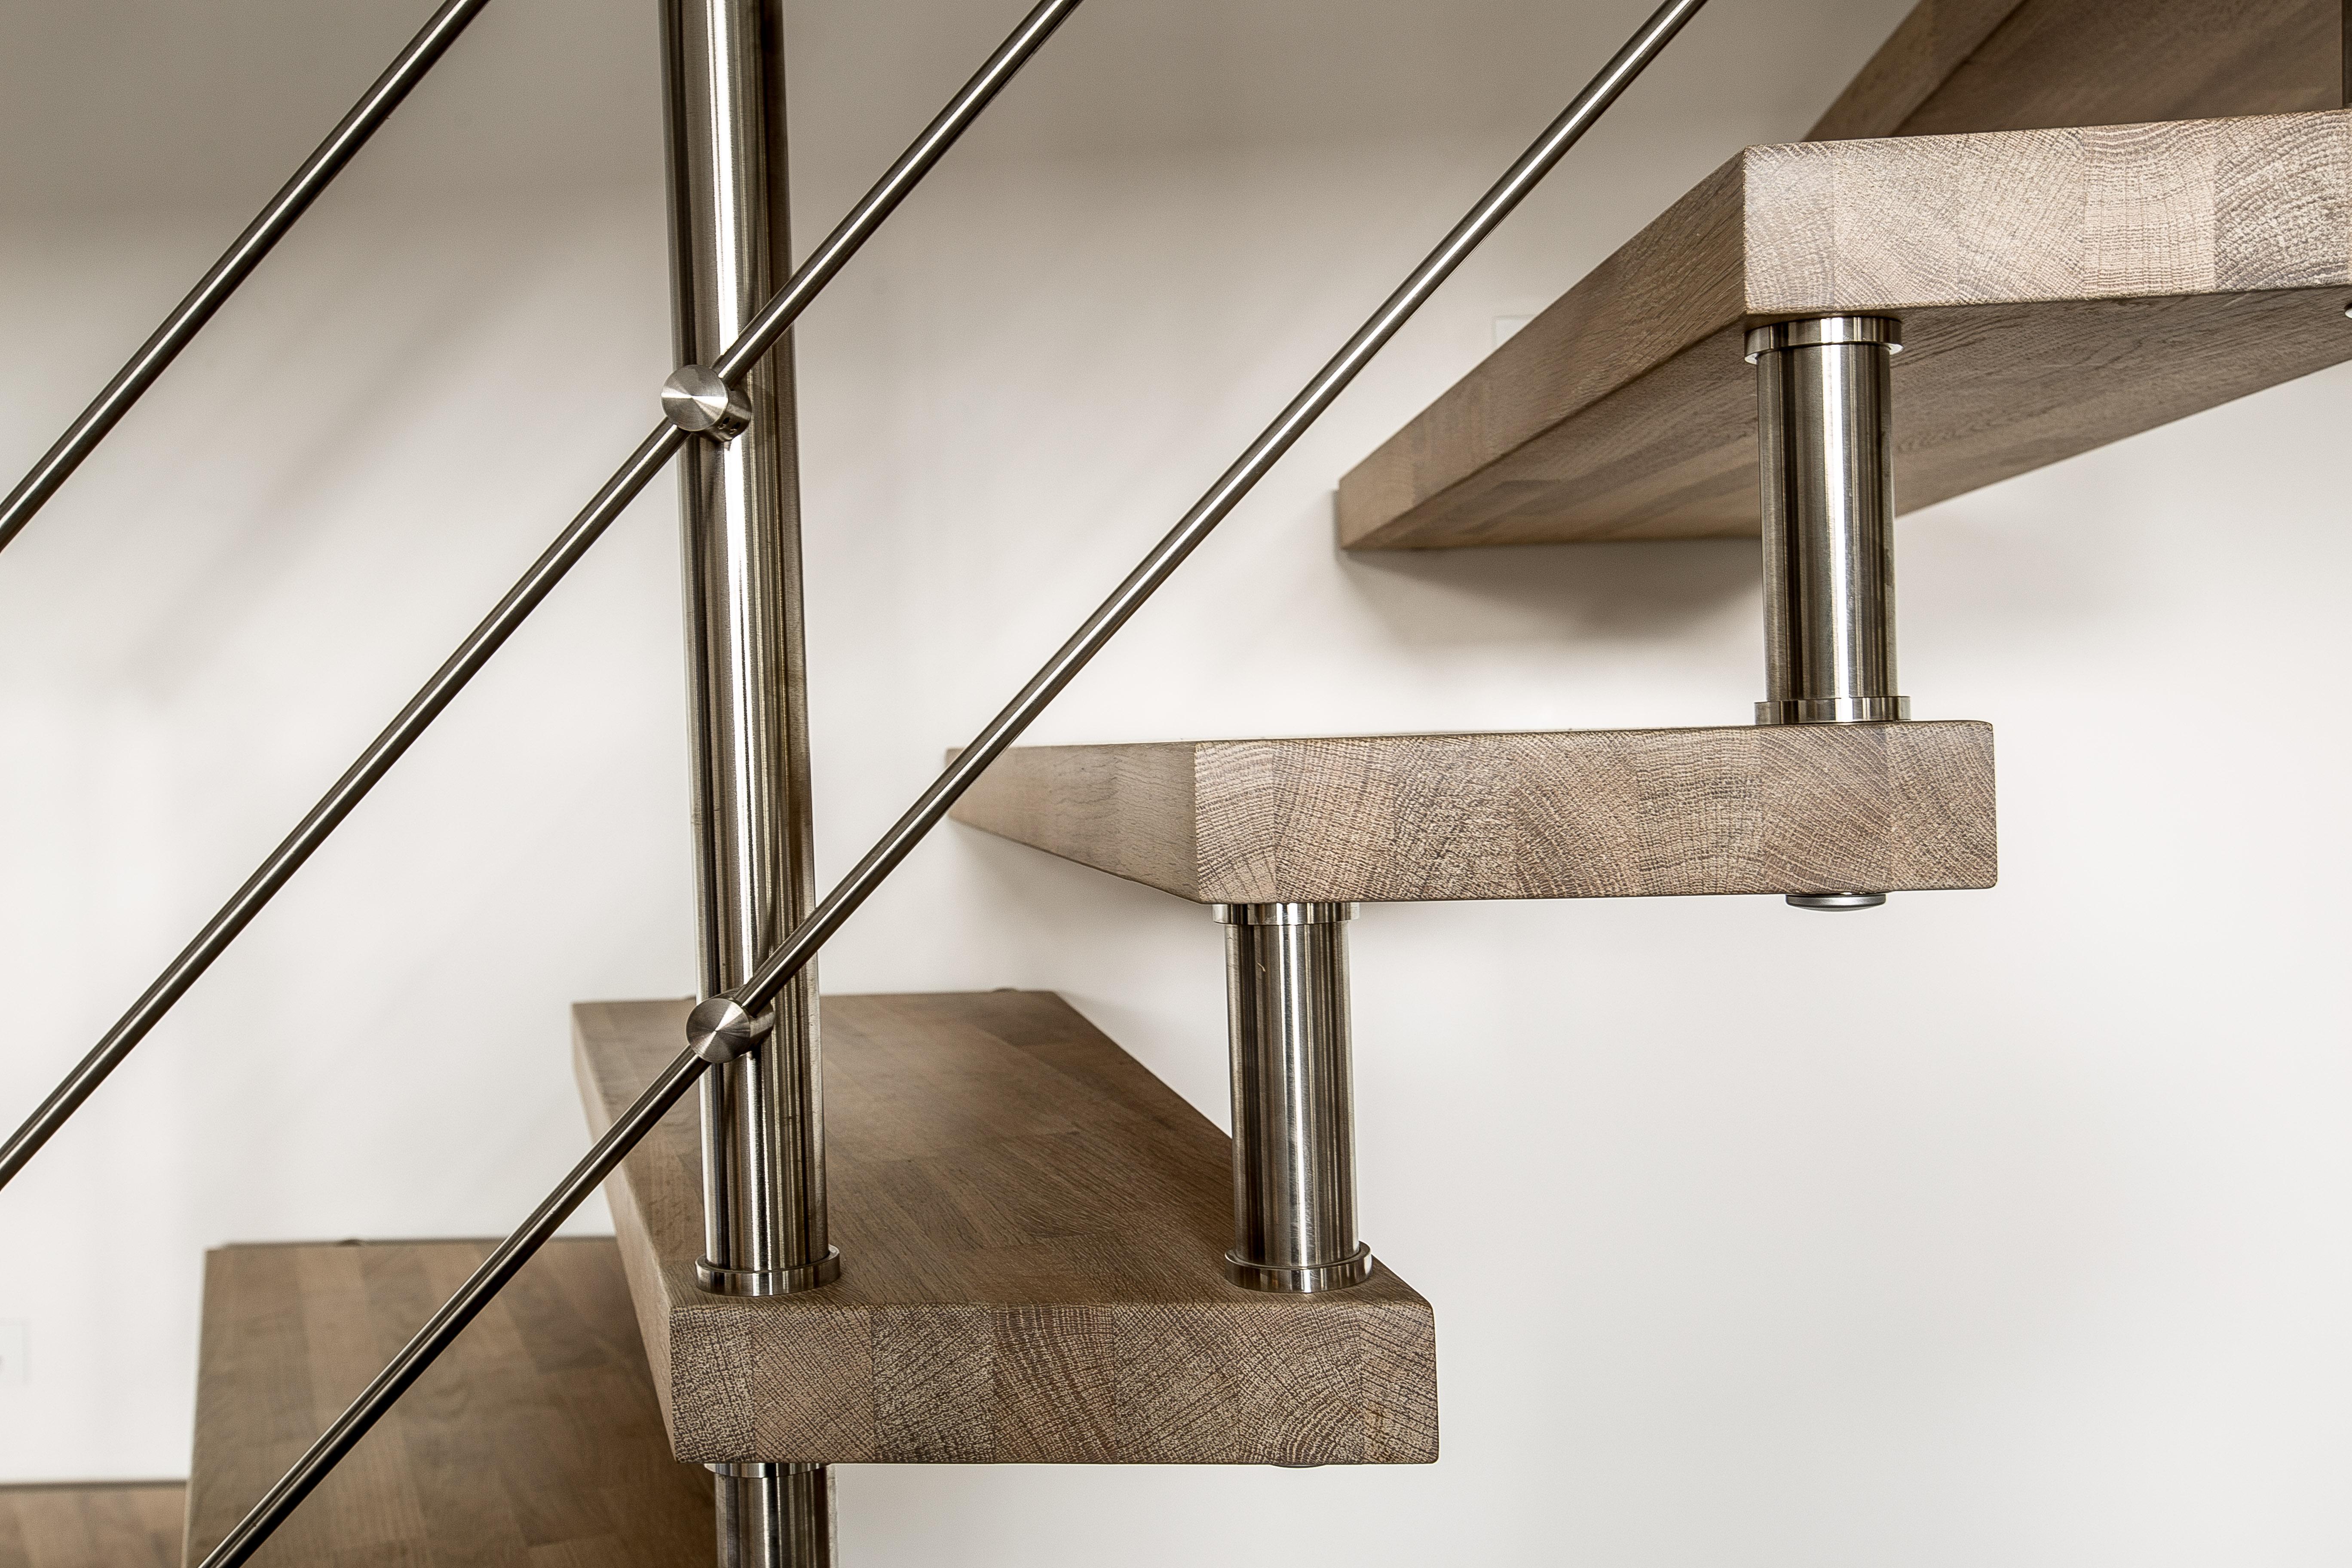 Escalier Epura chêne